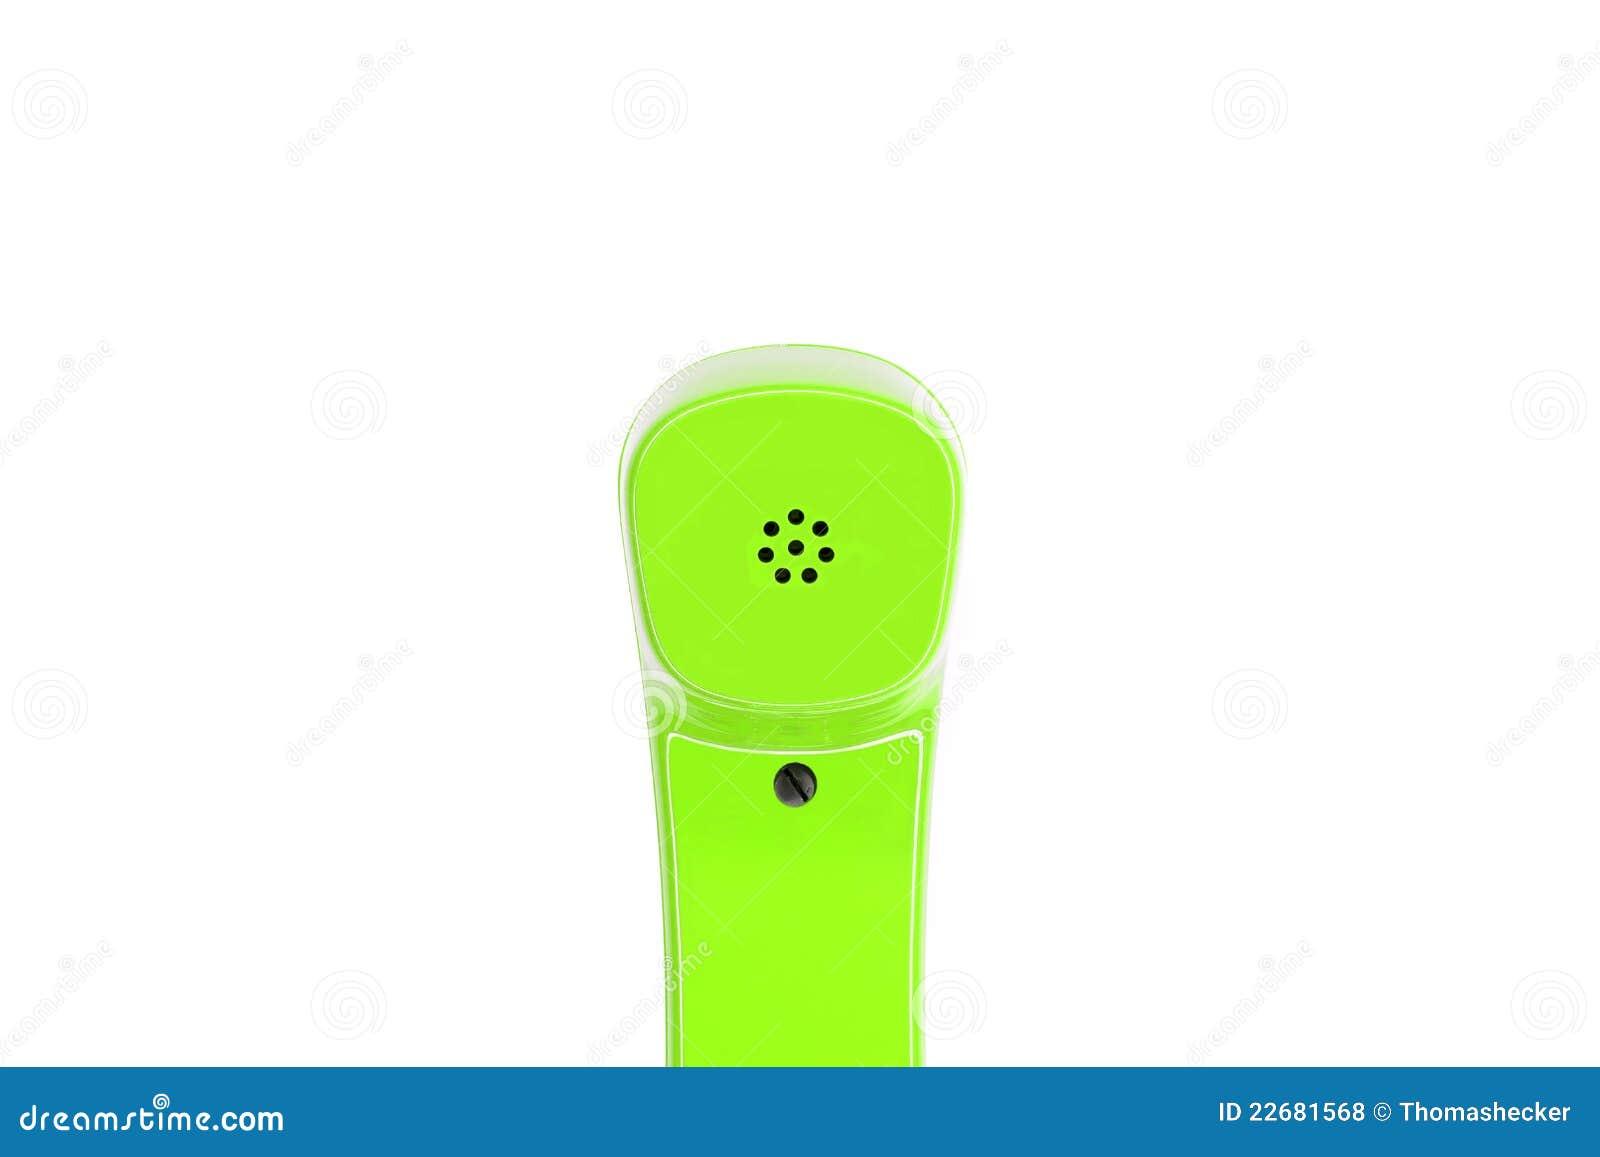 Grüner Telefonhörer im Detail